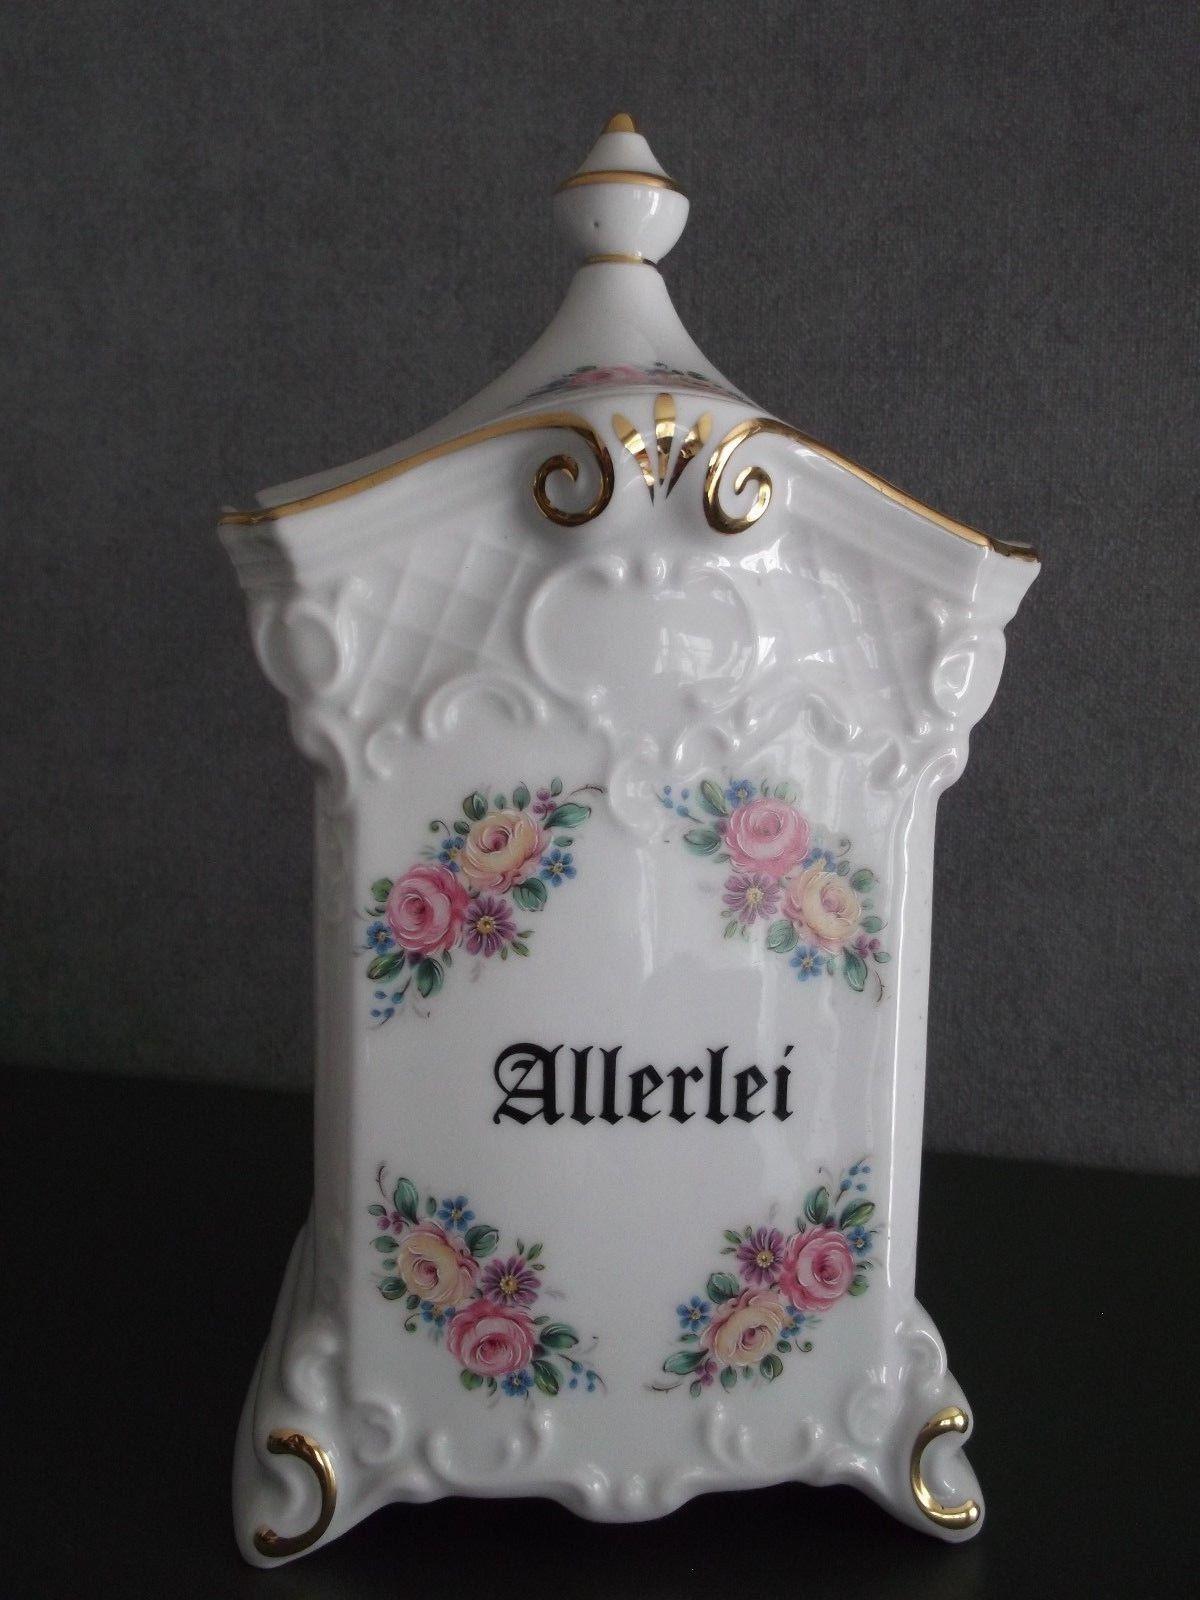 gerold porzellan vase of gerold porzellan vorratsdose keramikdose dose mit deckelallerlei for gerold porzellan vorratsdose keramikdose dose mit deckelallerlei 1 von 5 gerold porzellan